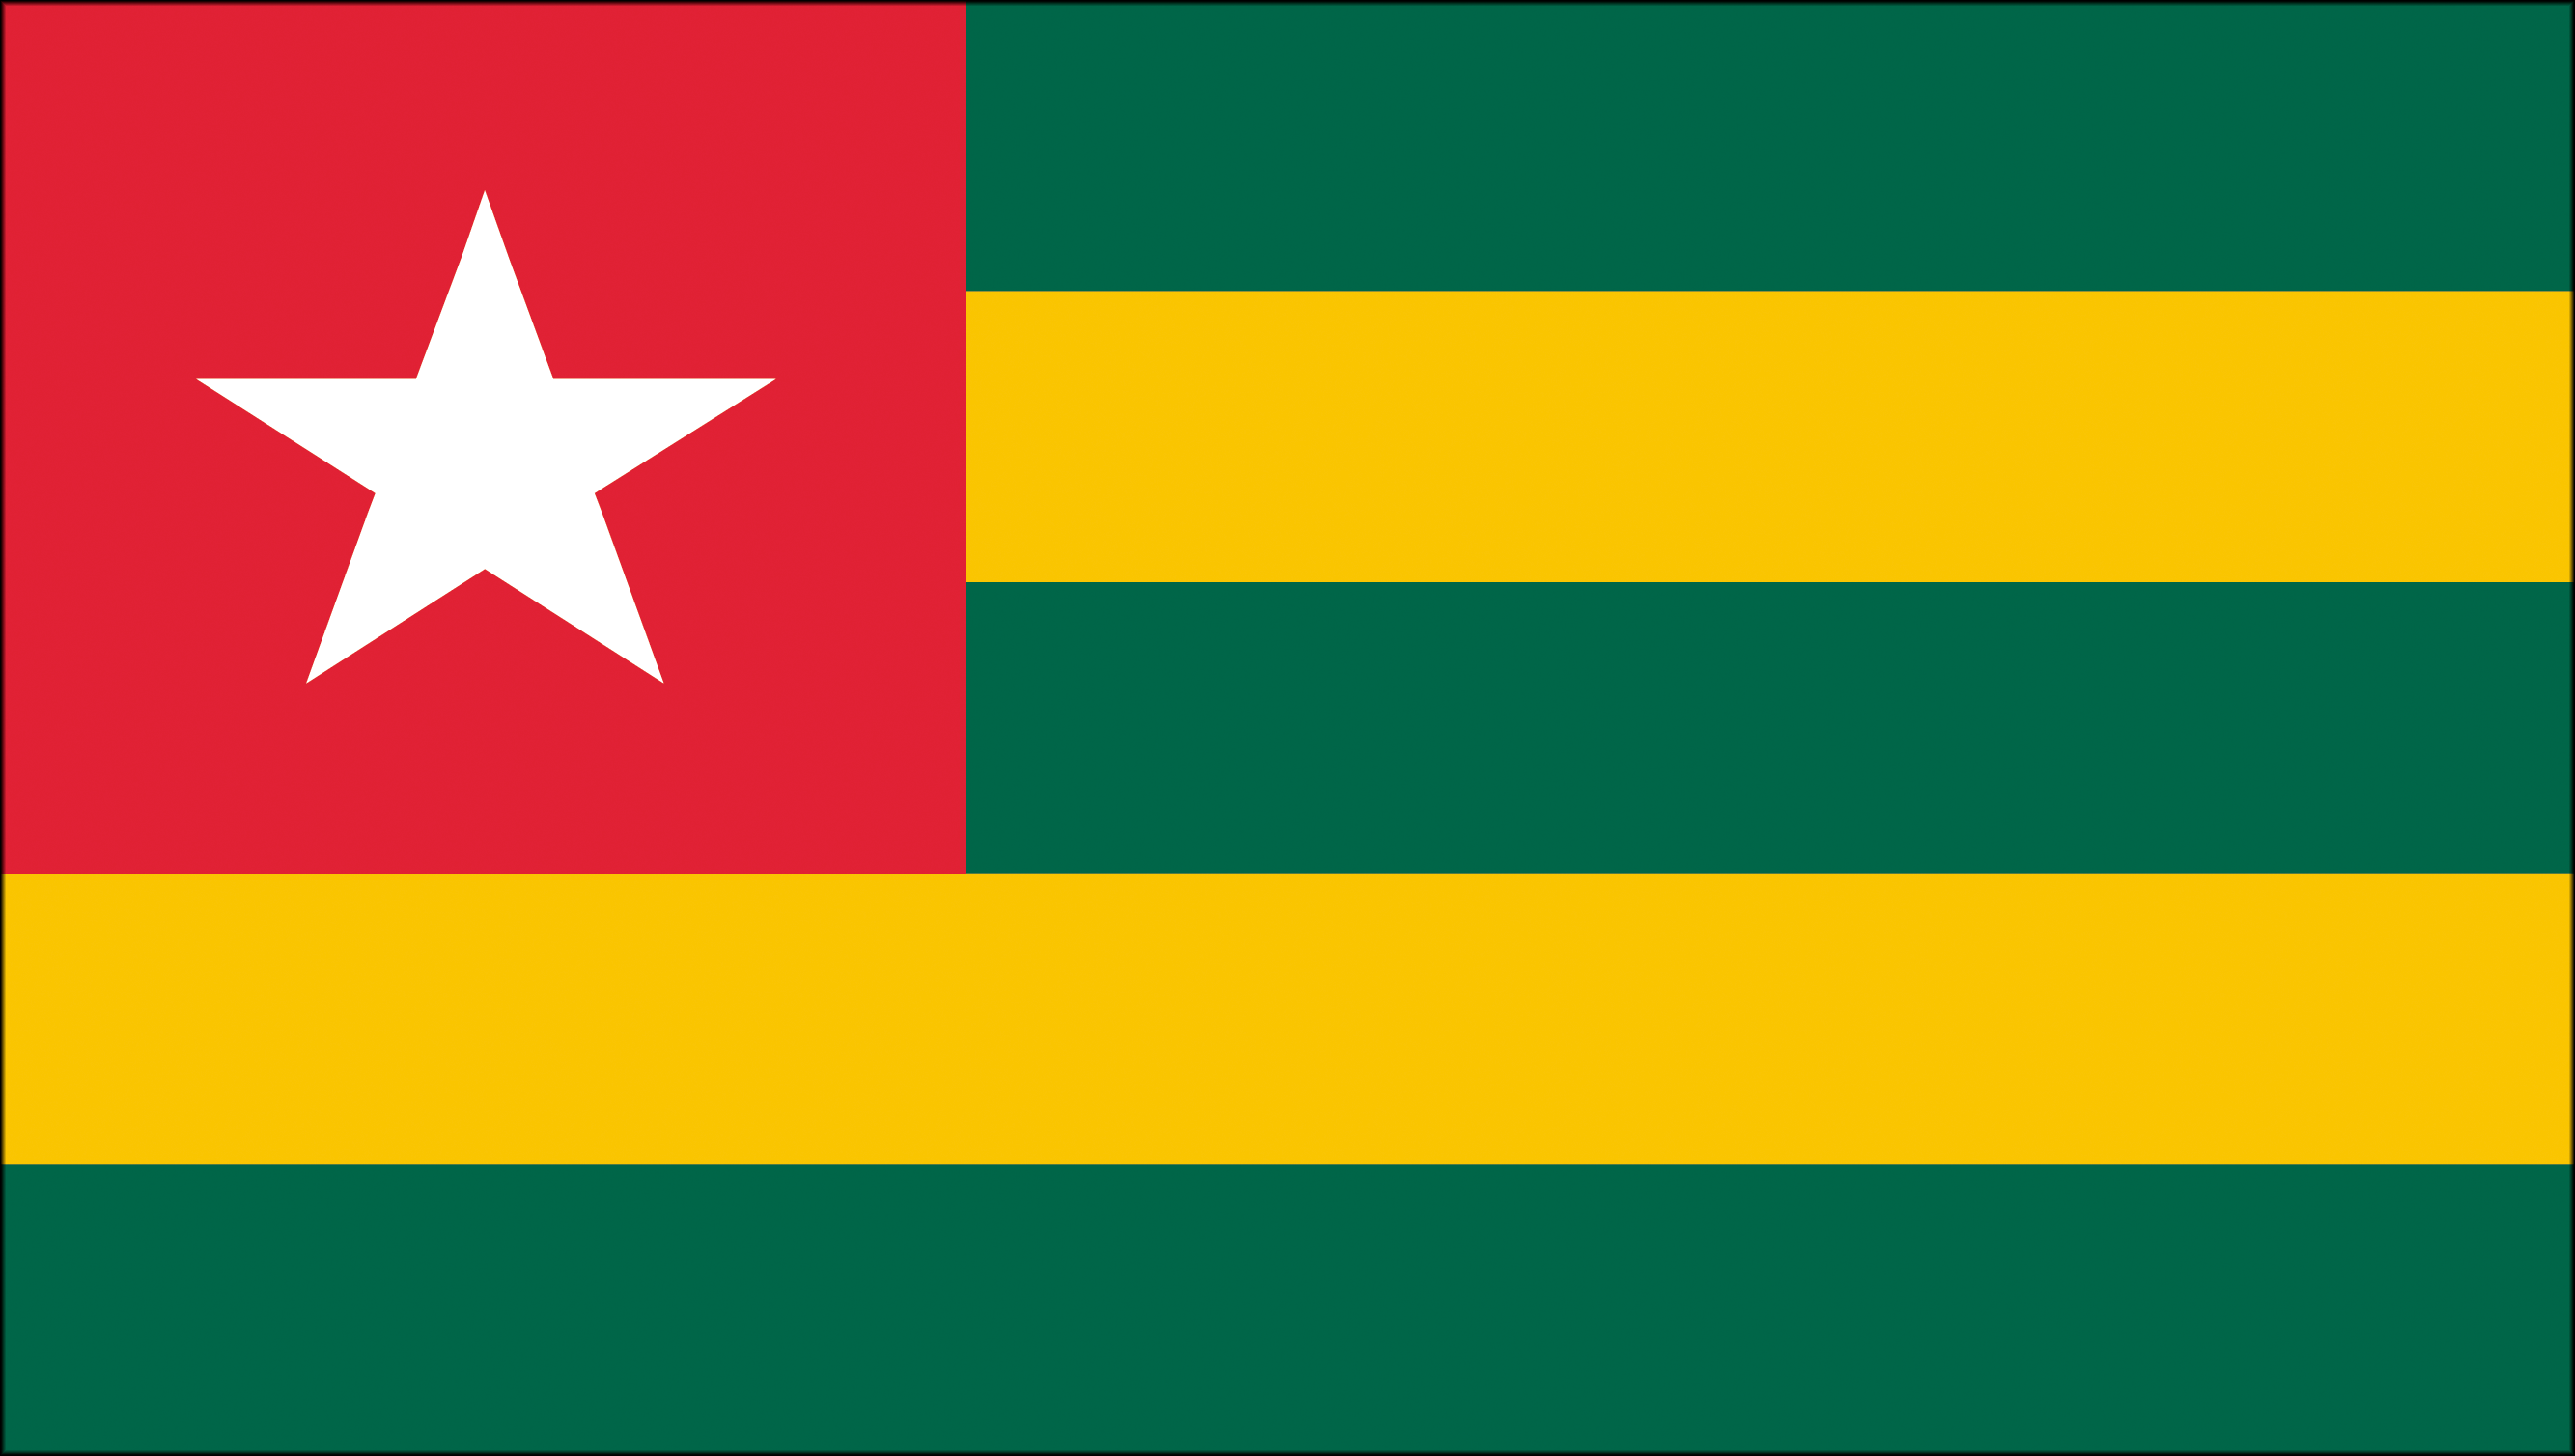 Bandera De Togo Banderas Escudo De Armas Escudo